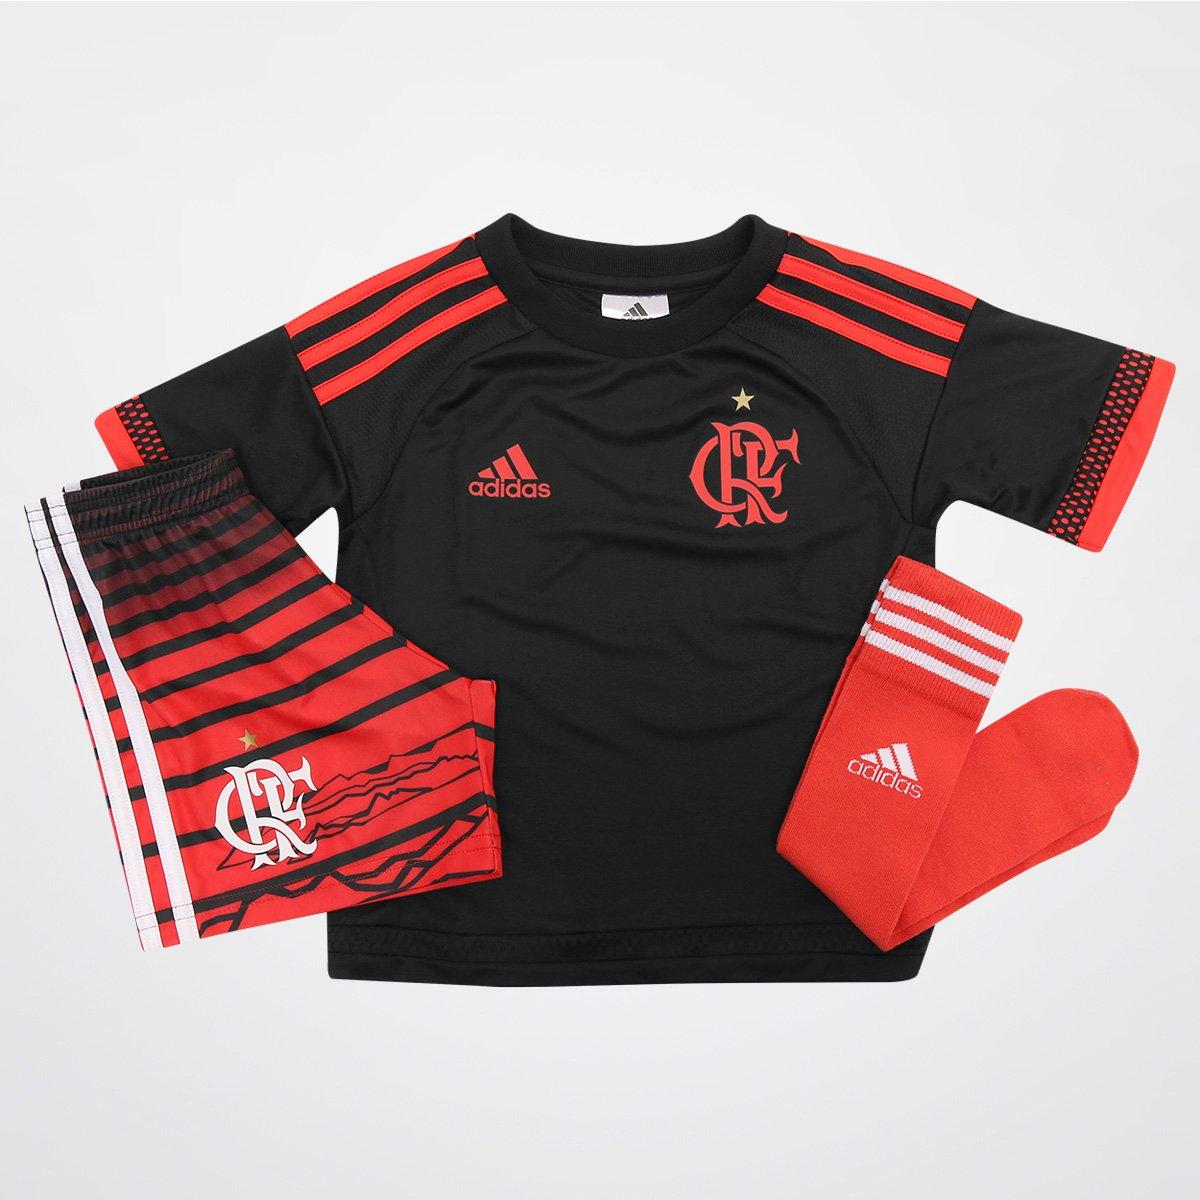 Kit Adidas Flamengo III 2016 Infantil - Compre Agora  b7ed27d92011c